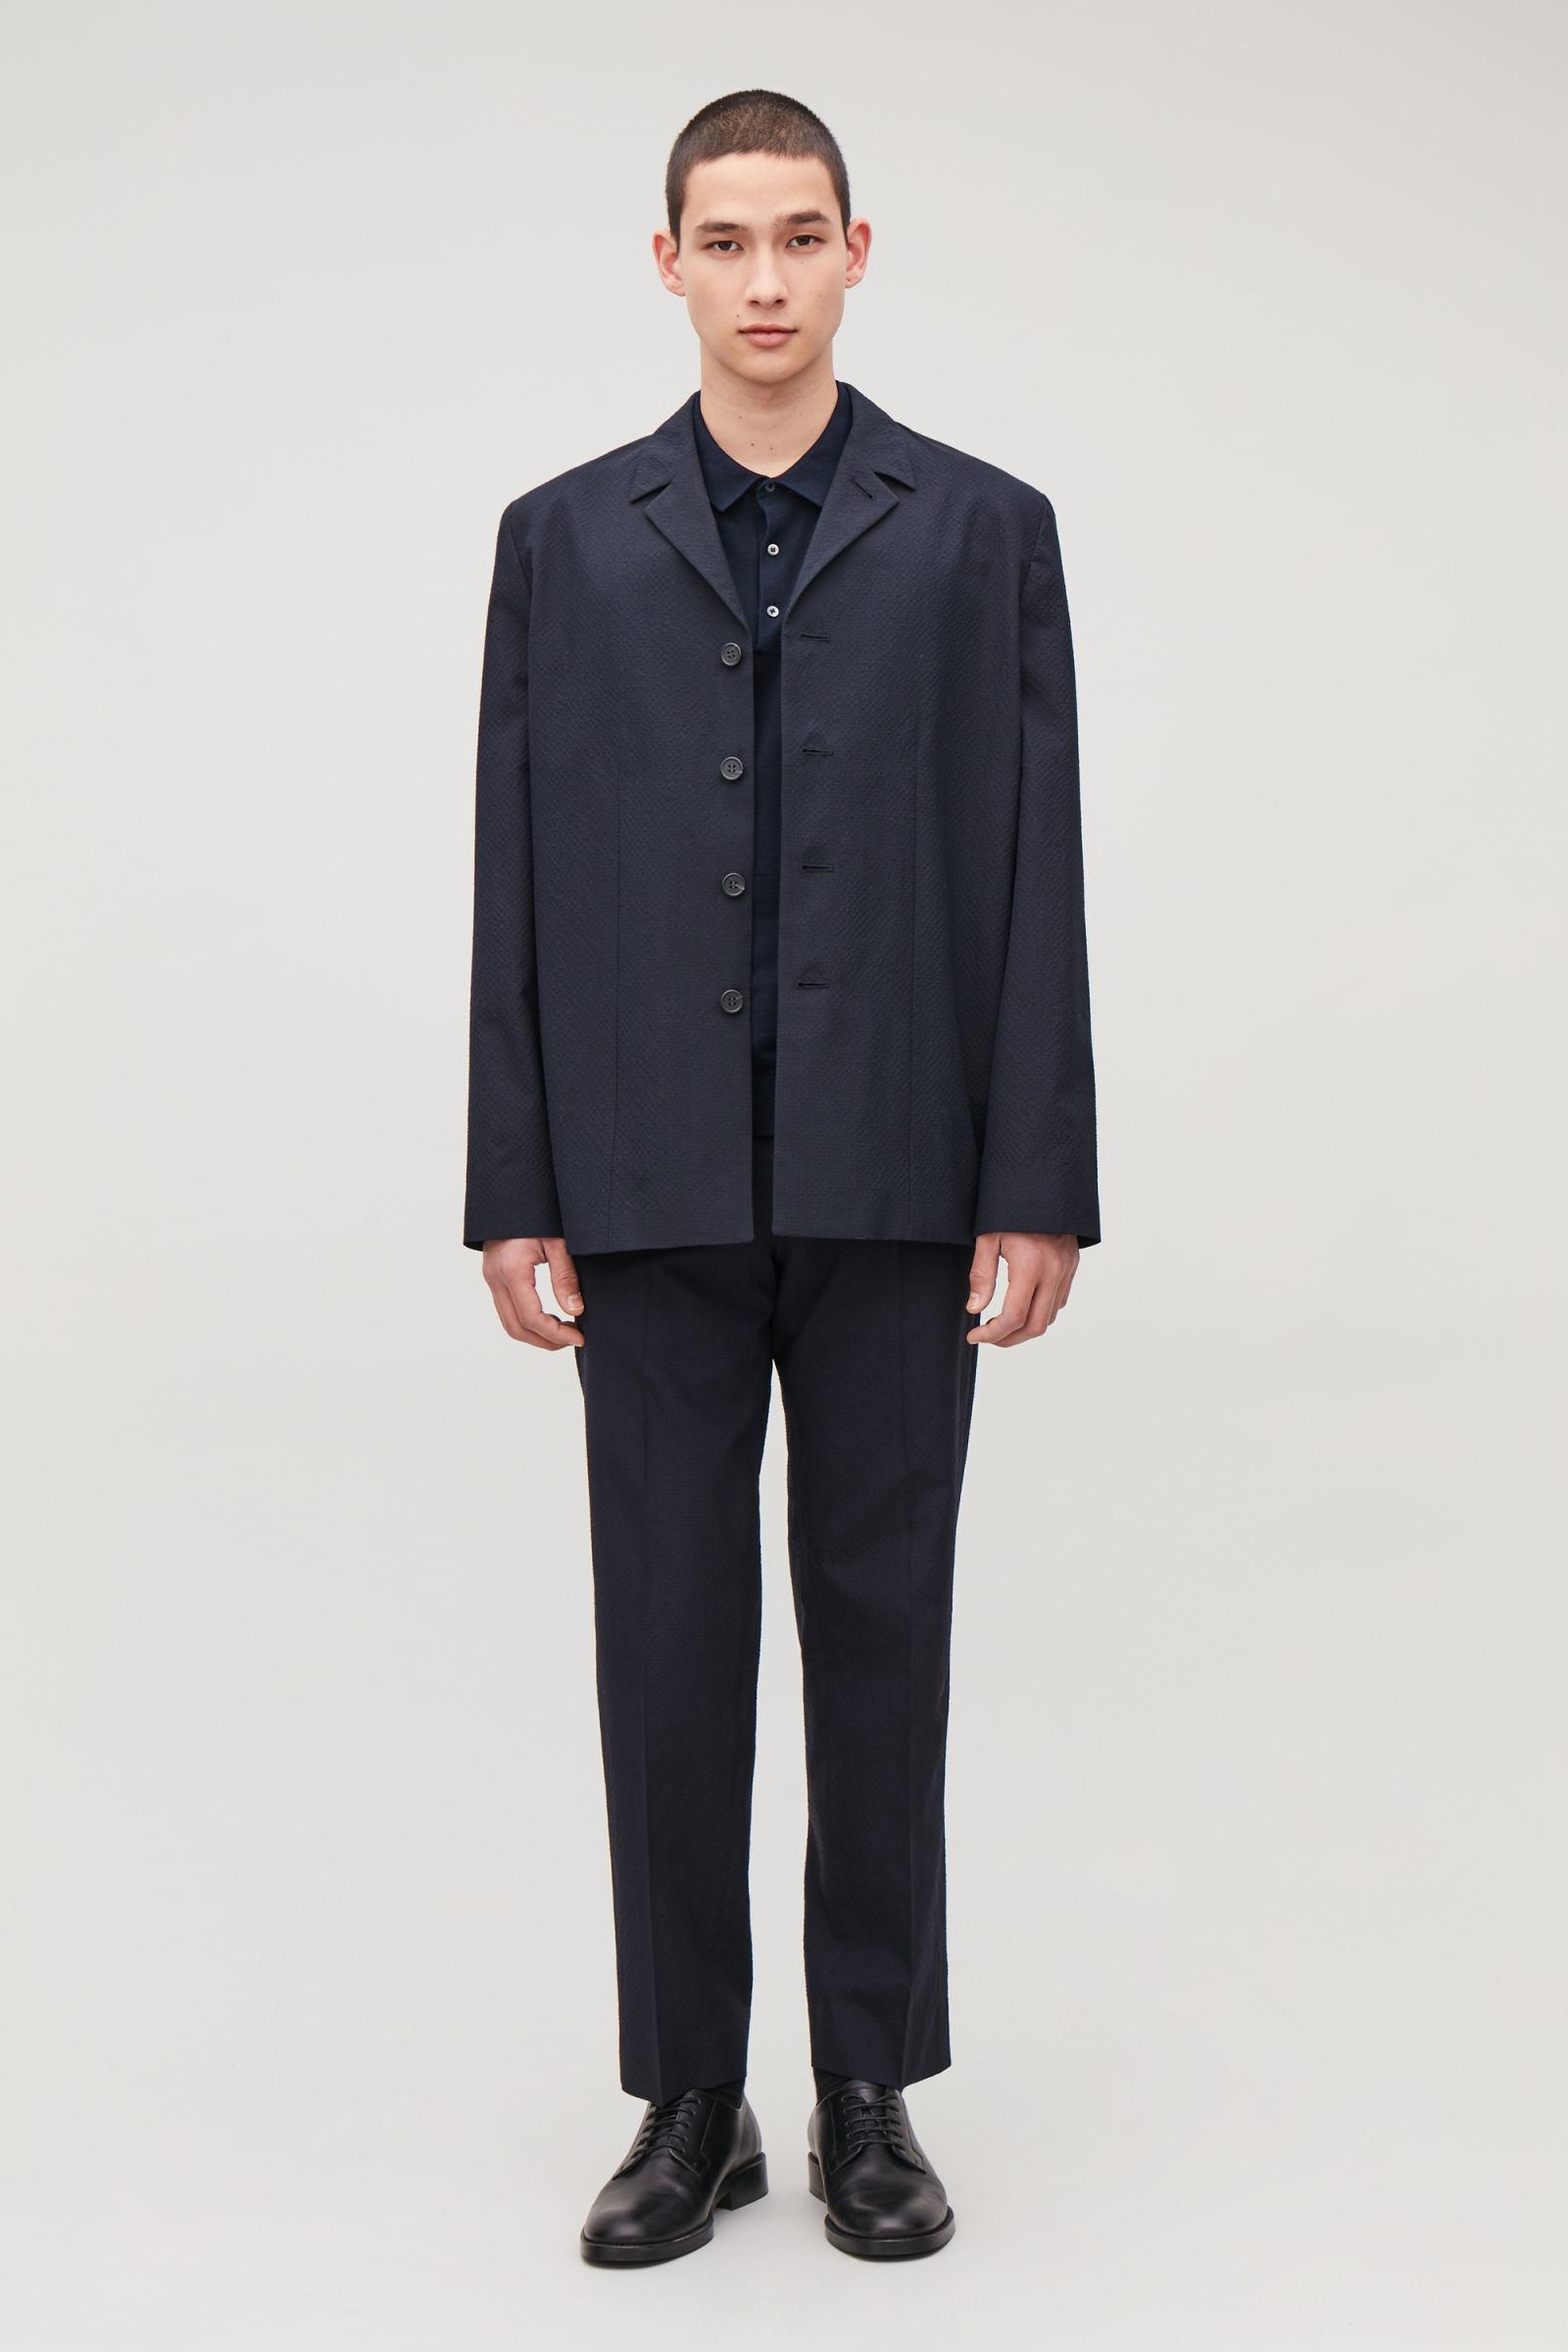 COS 실크 코튼 폴로 셔츠의 네이비컬러 모델컷입니다.